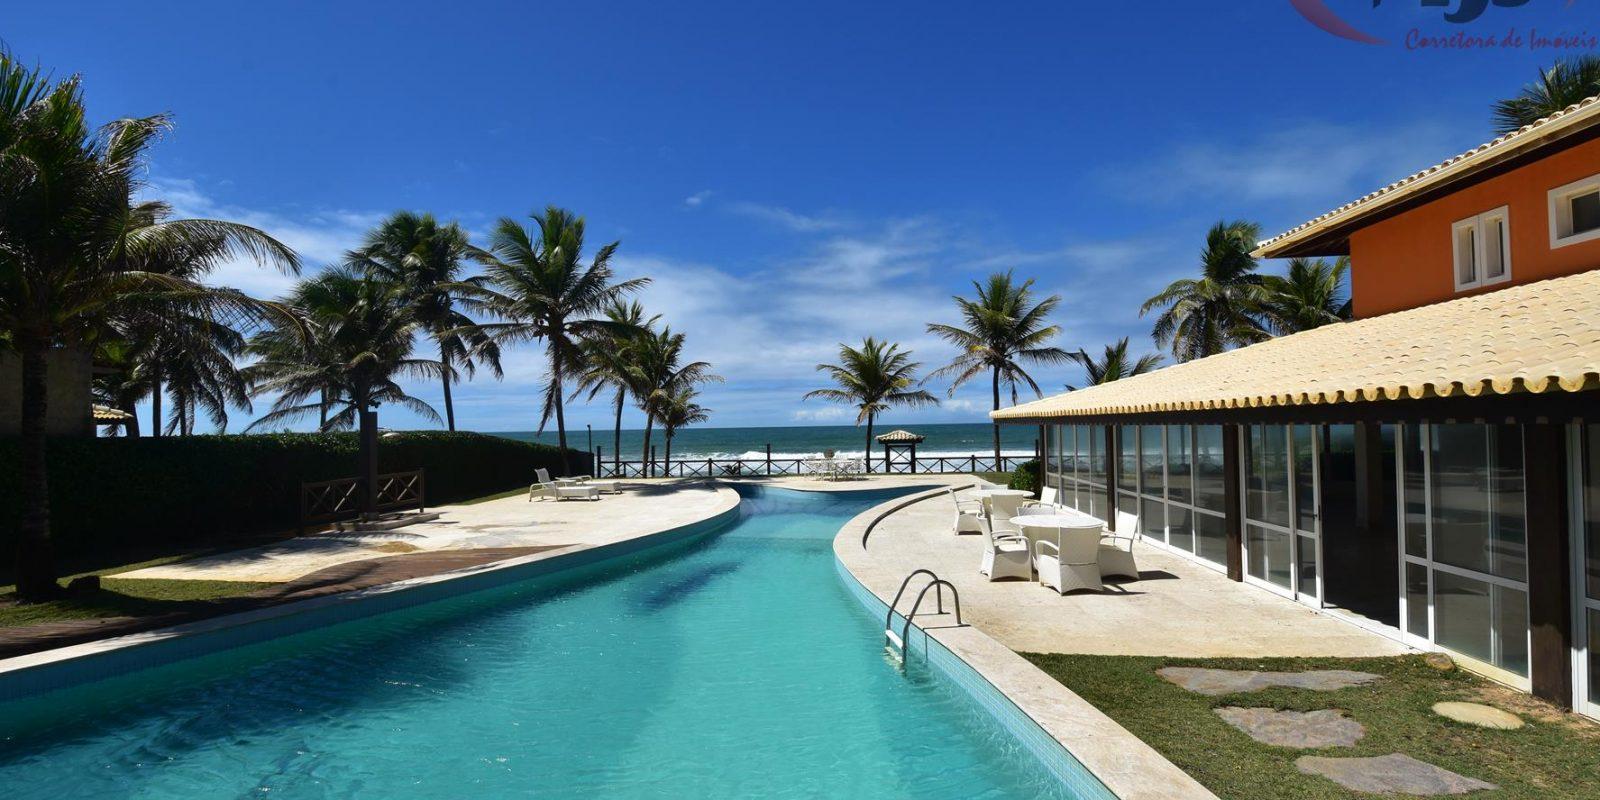 Luxury beachfront at Busca Vida